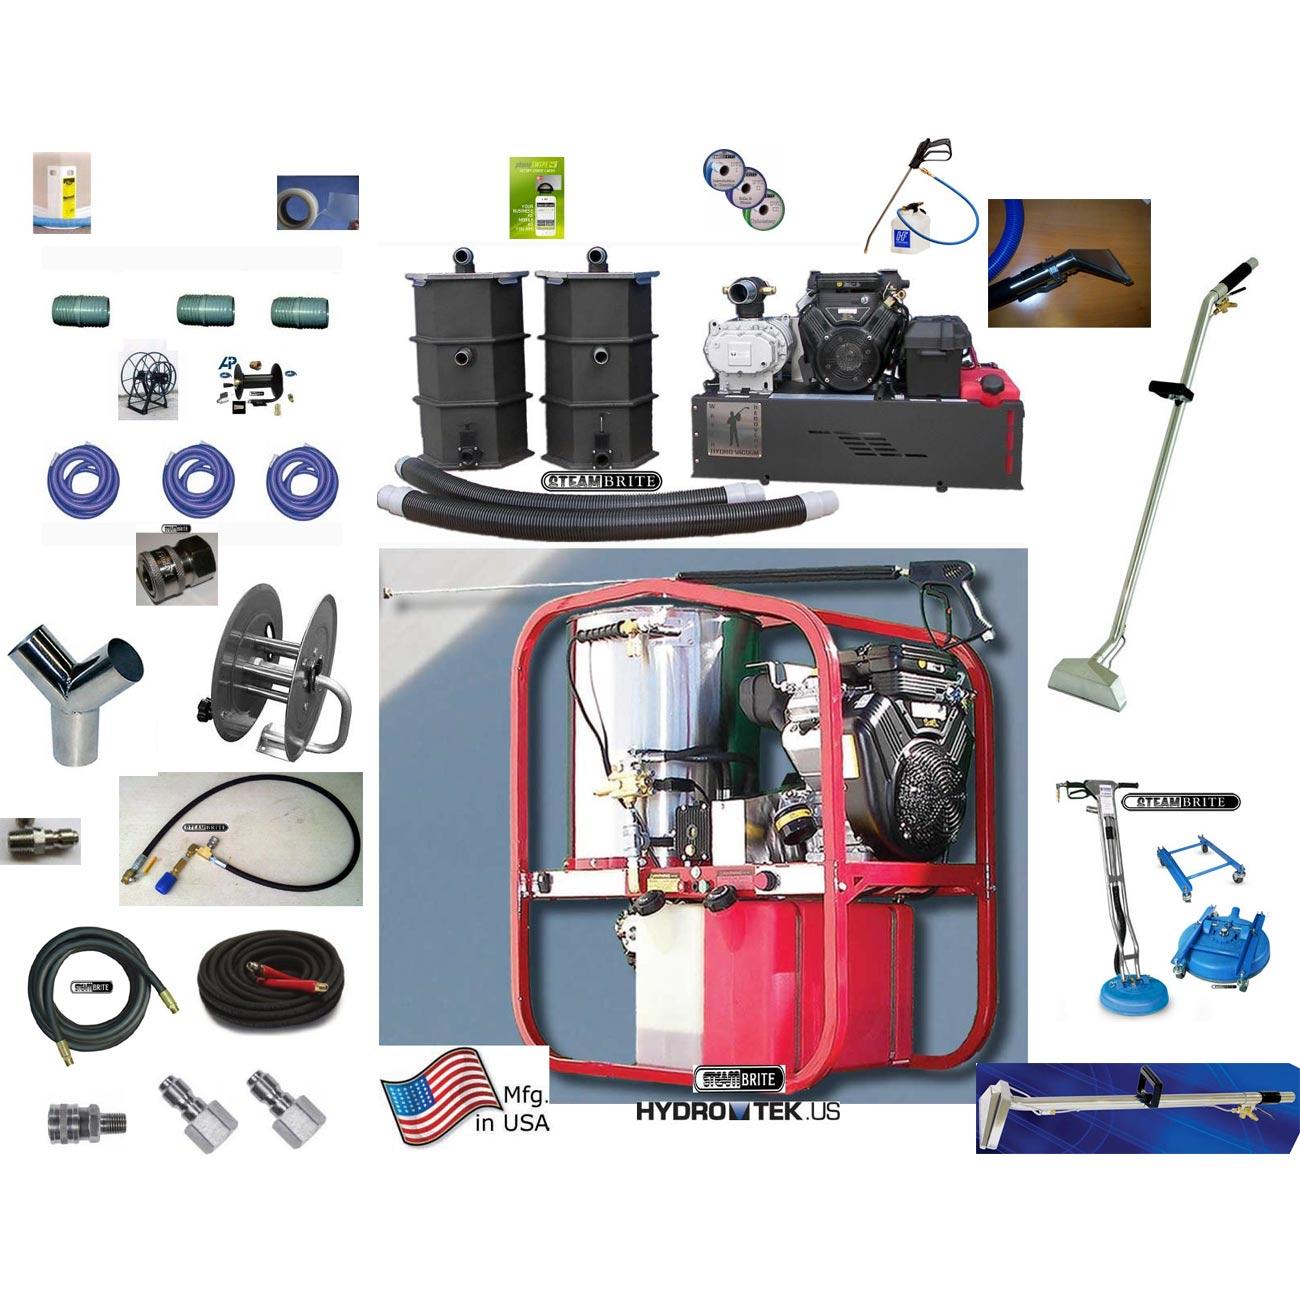 hight resolution of hydrotek rce boss hydrotek synergistic truckmount 37 hp 3000 psi 4 8 gpm 45 blower auto dump flood pumper